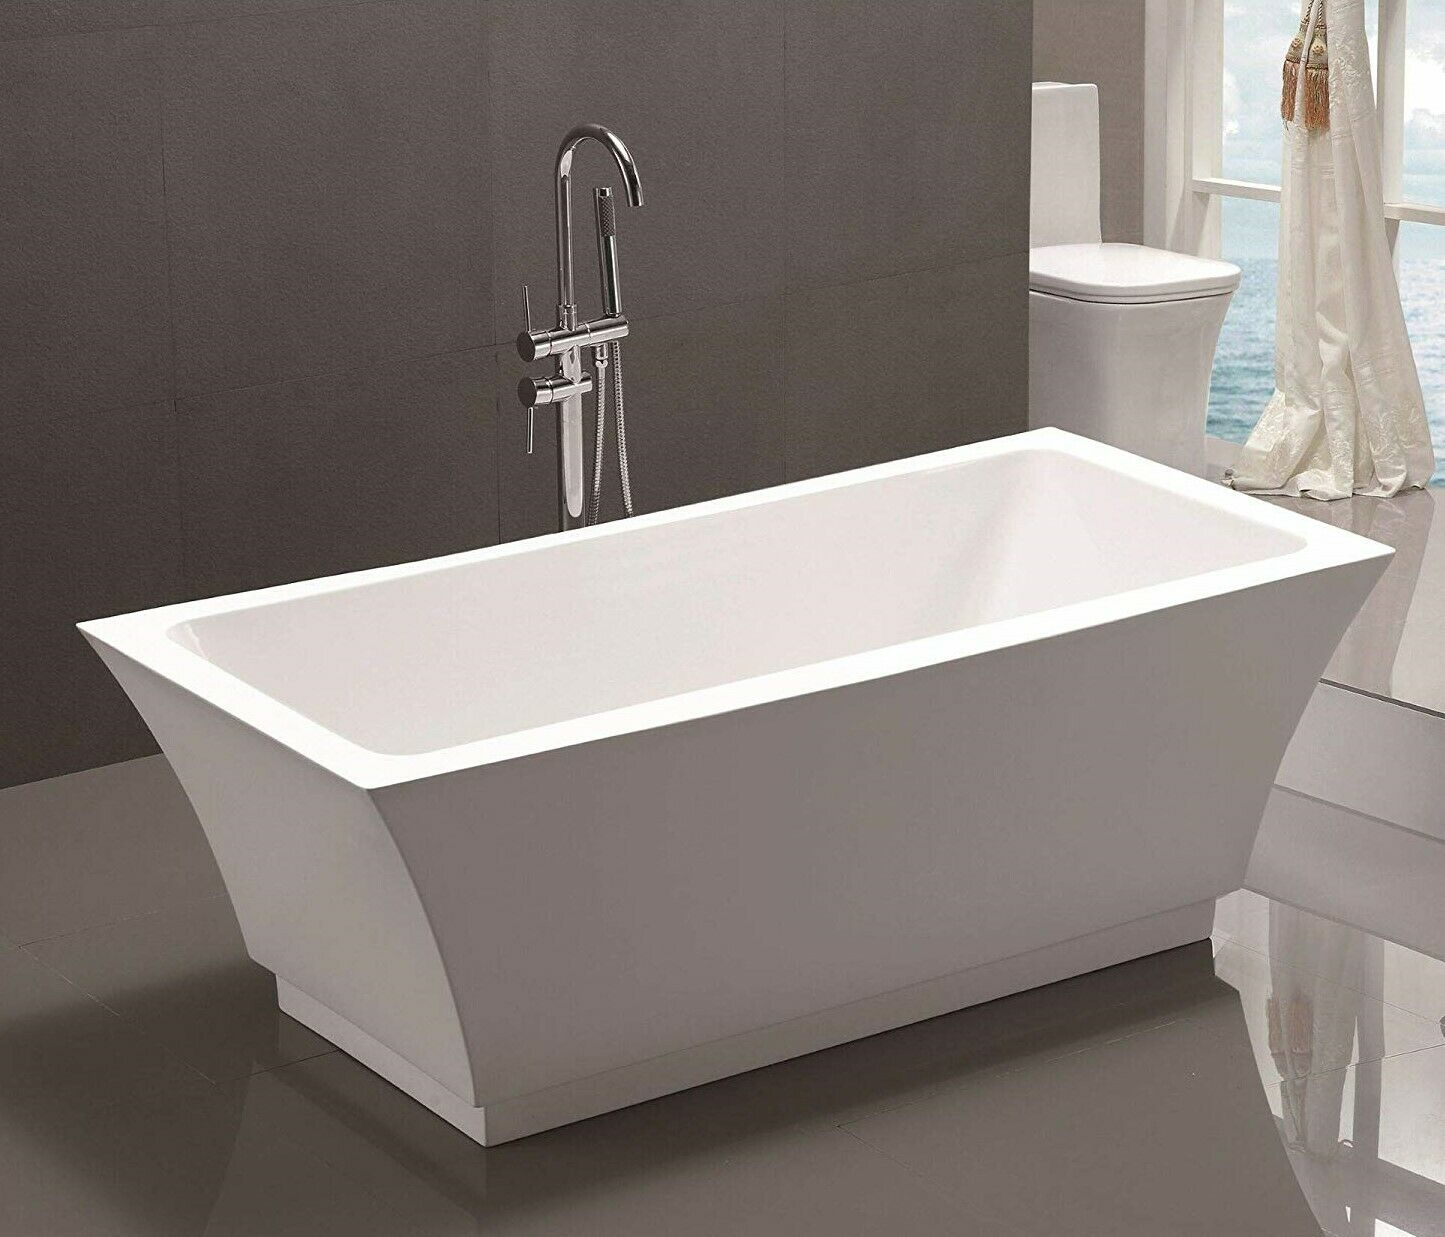 67 Freestanding Bathtub White Acrylic Modern Rectangular Soaking Tub